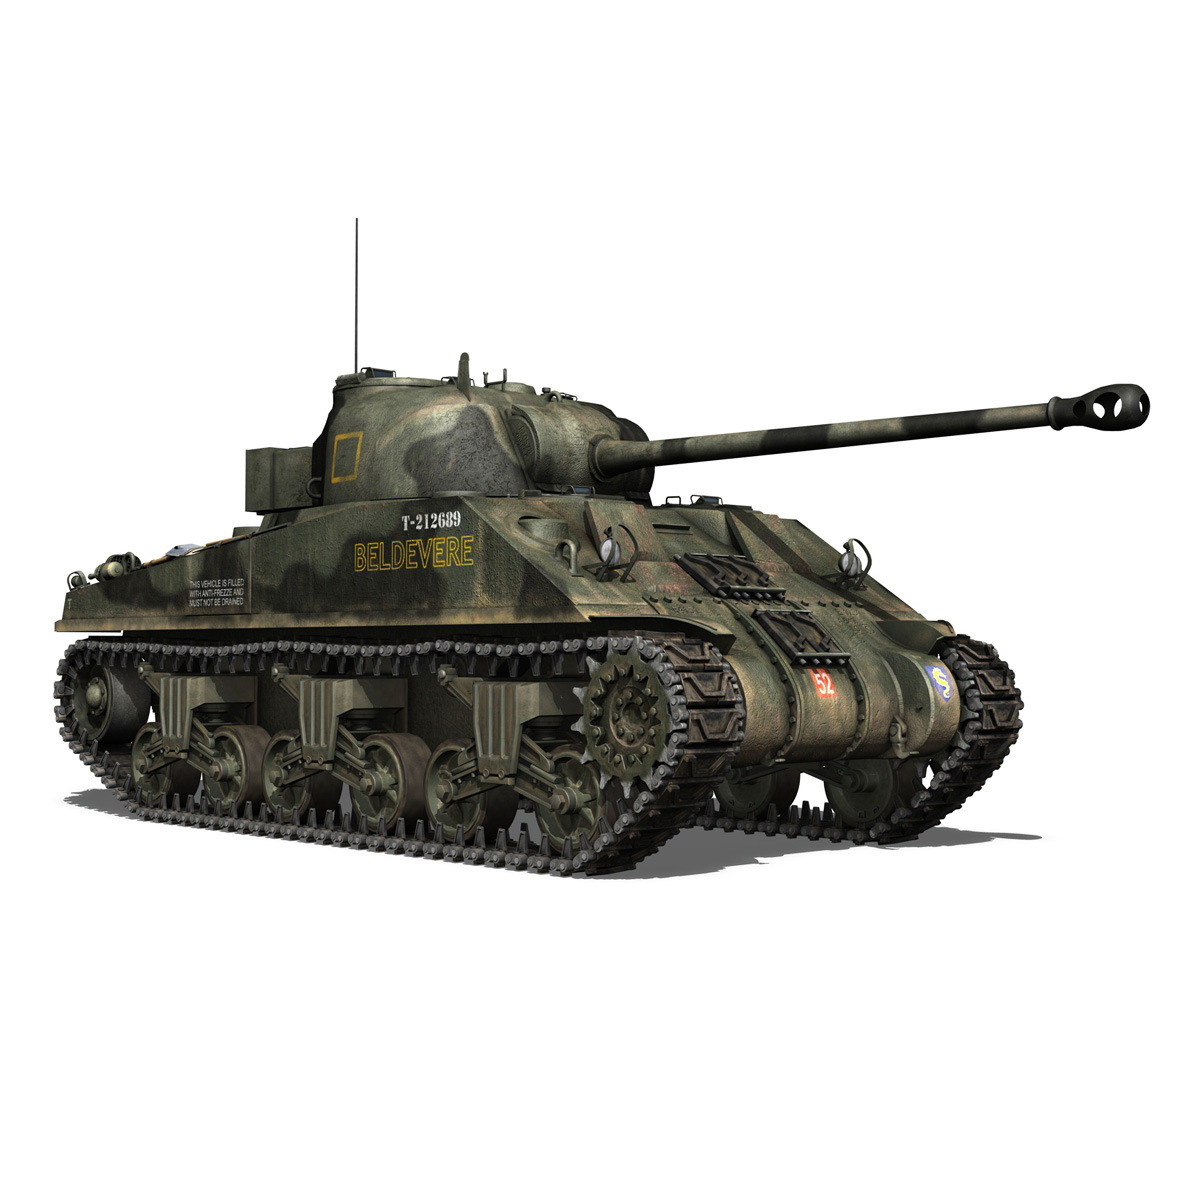 Sherman MK VC Firefly - Beldevere 3d model  266018